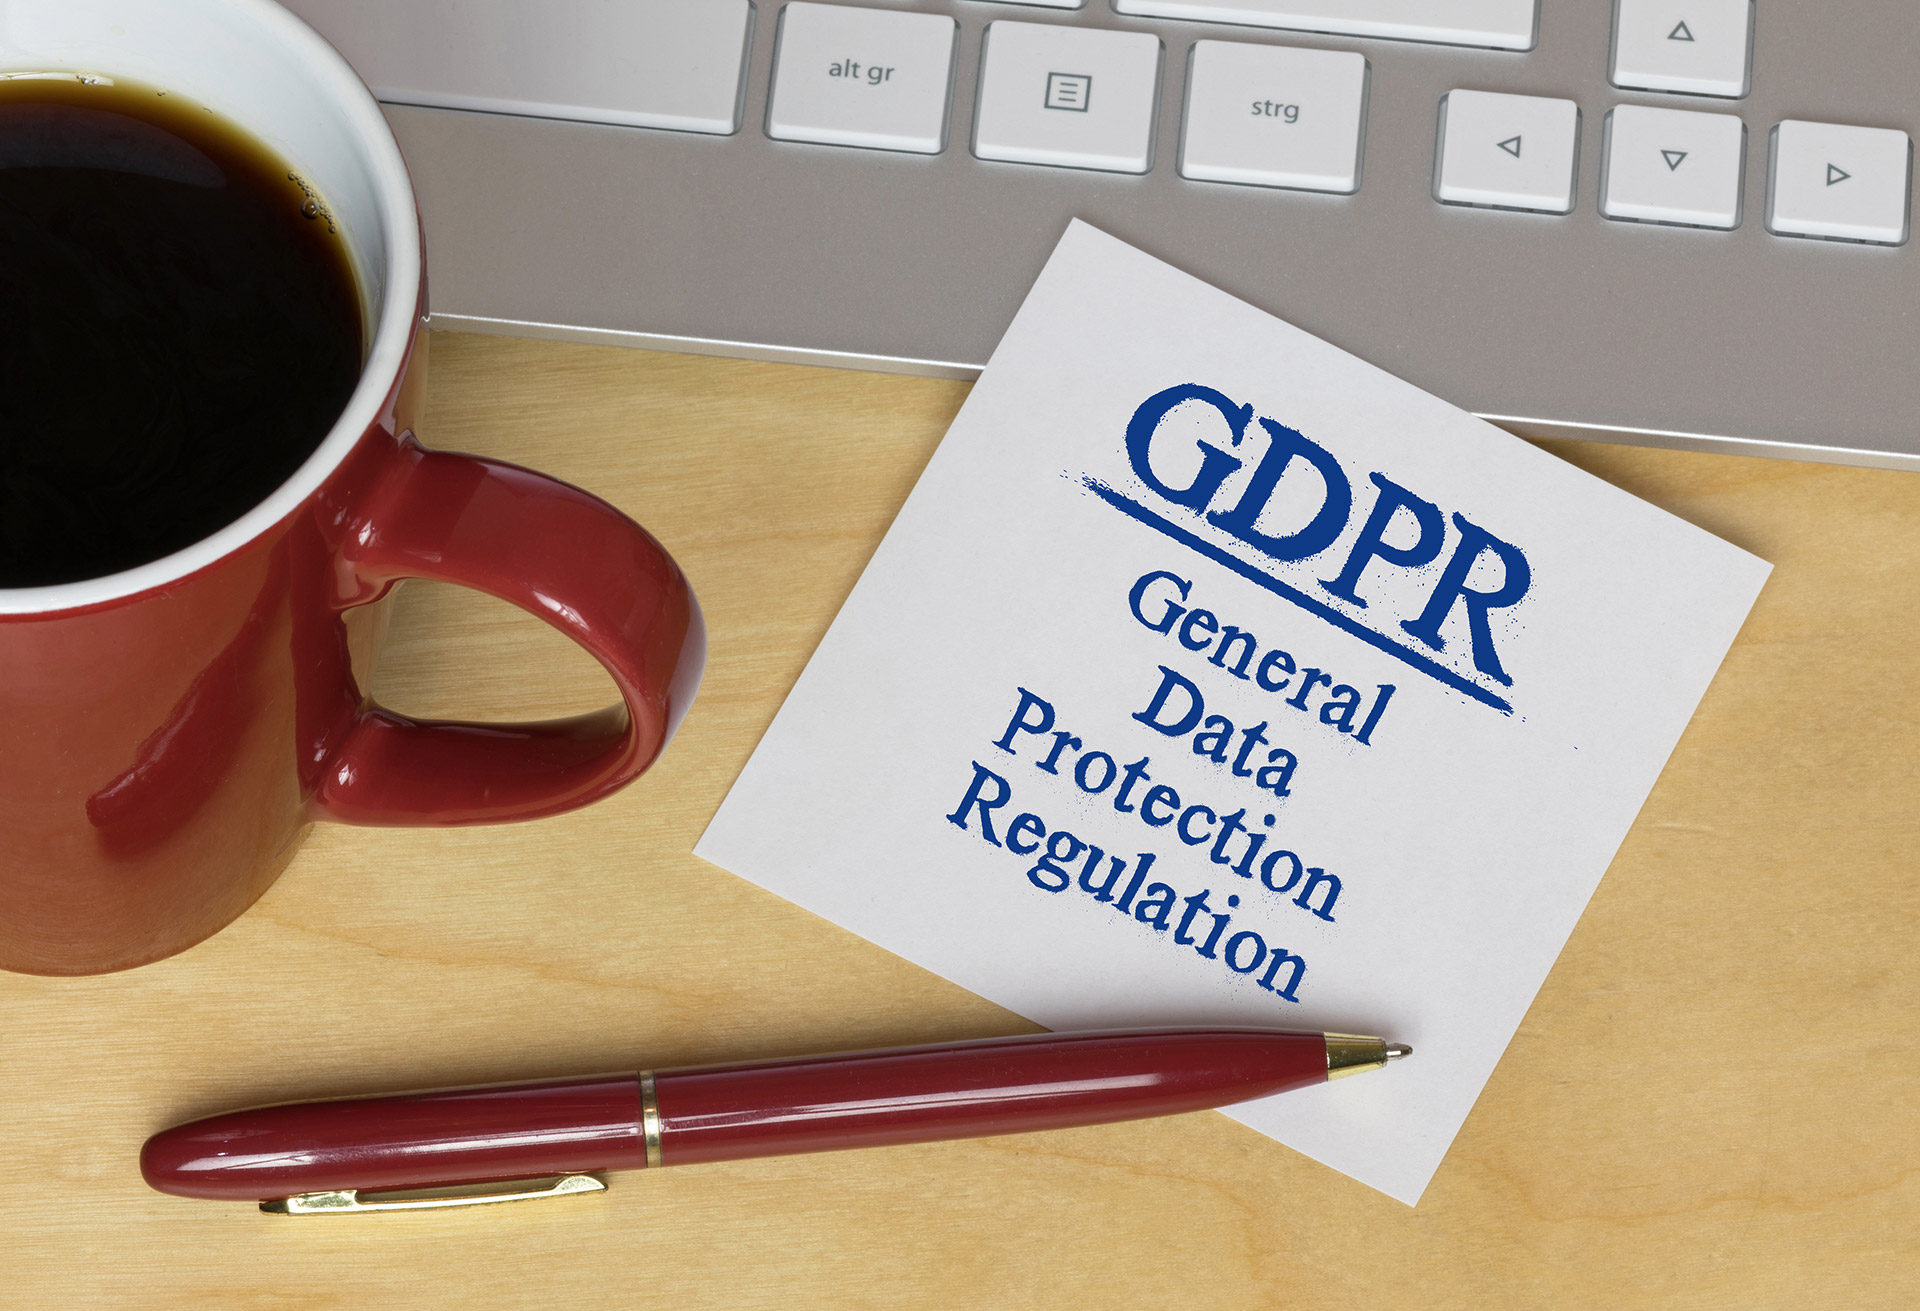 GDPR Call Recording Regulations